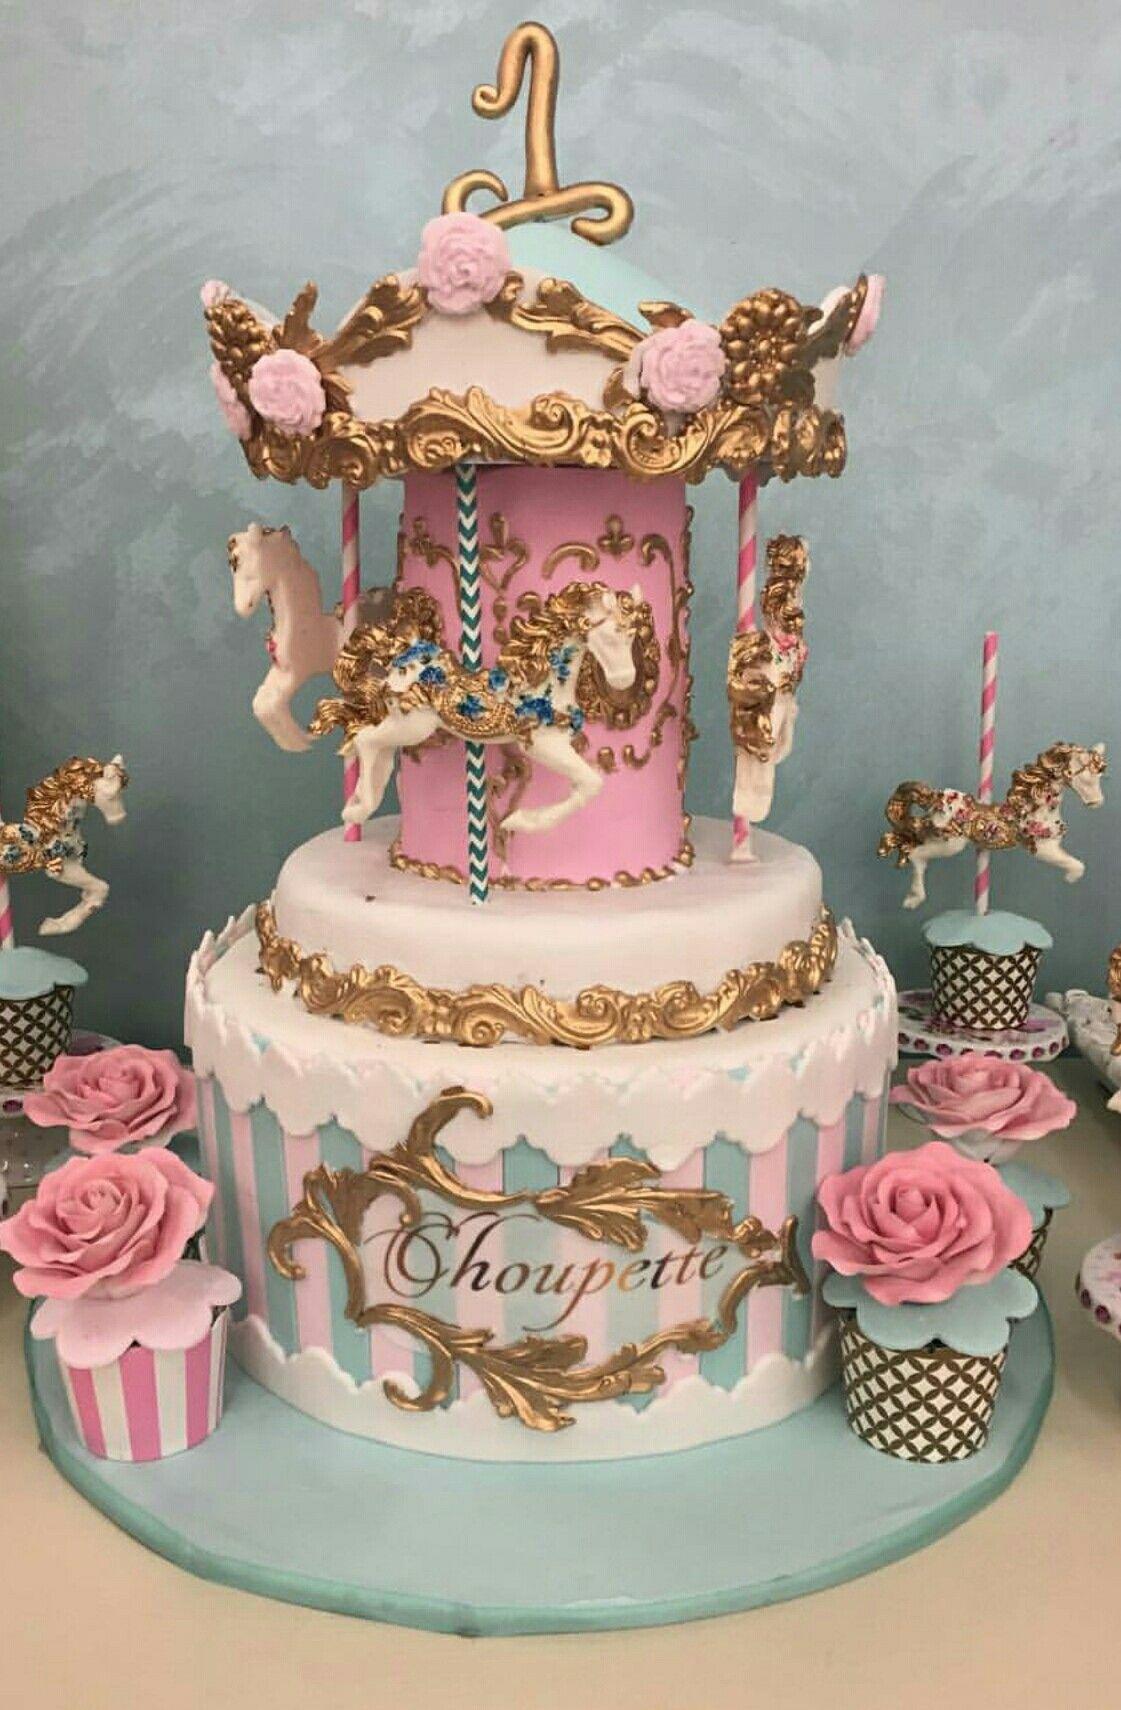 Vintage carousel cake cakes Pinterest Cakes, Carousels and Recetas